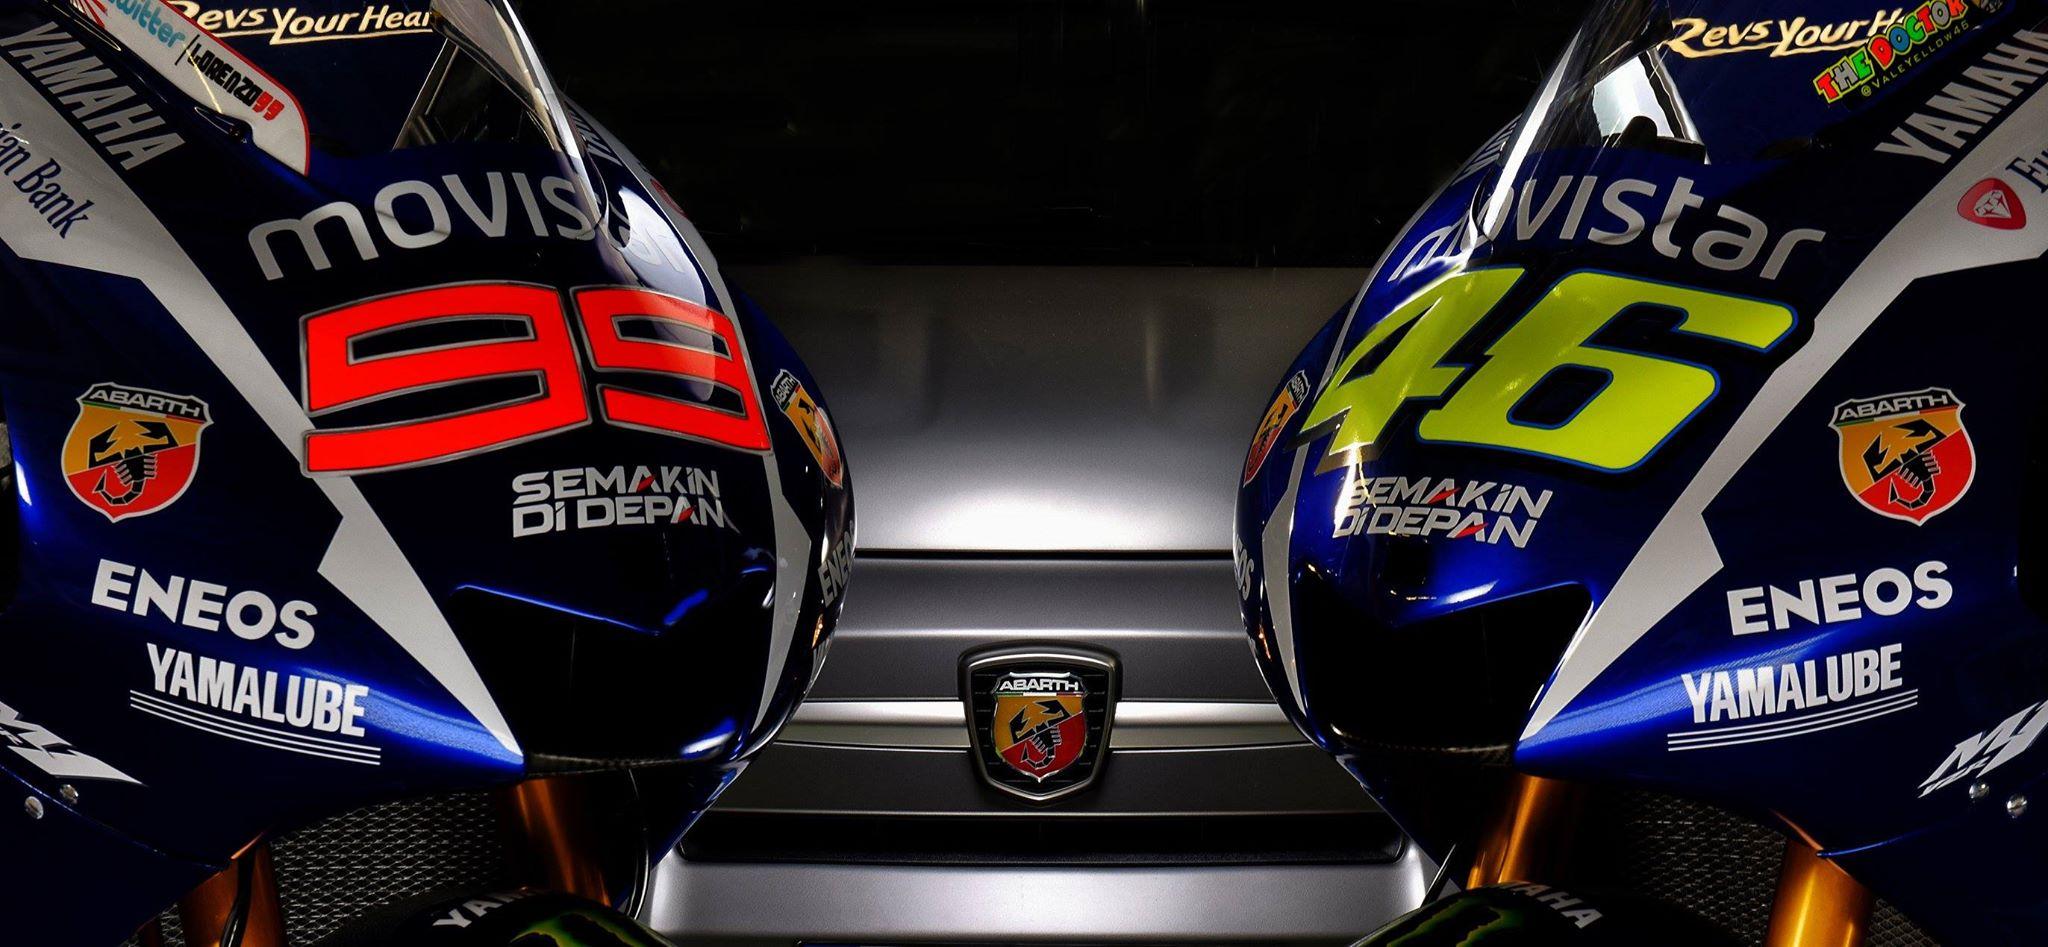 Abarth, sponsor Yamaha MotoGP